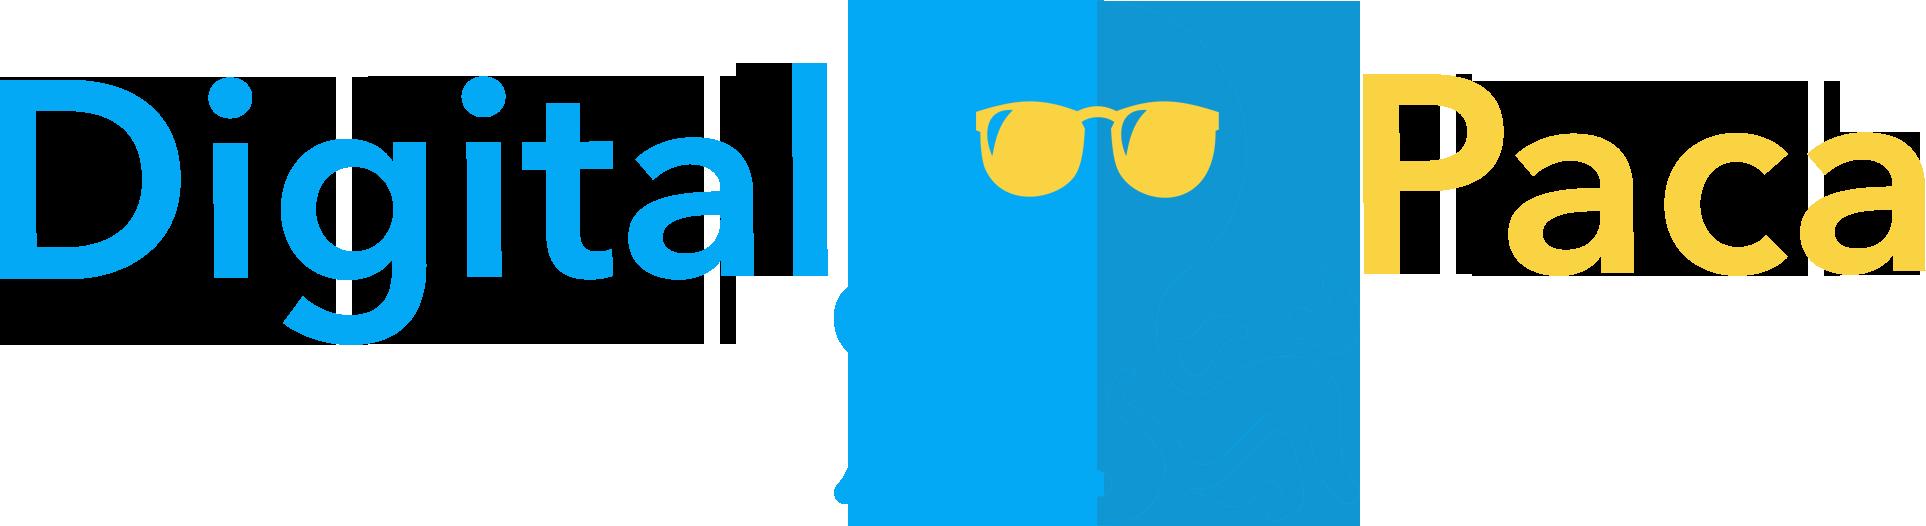 Digital PACA